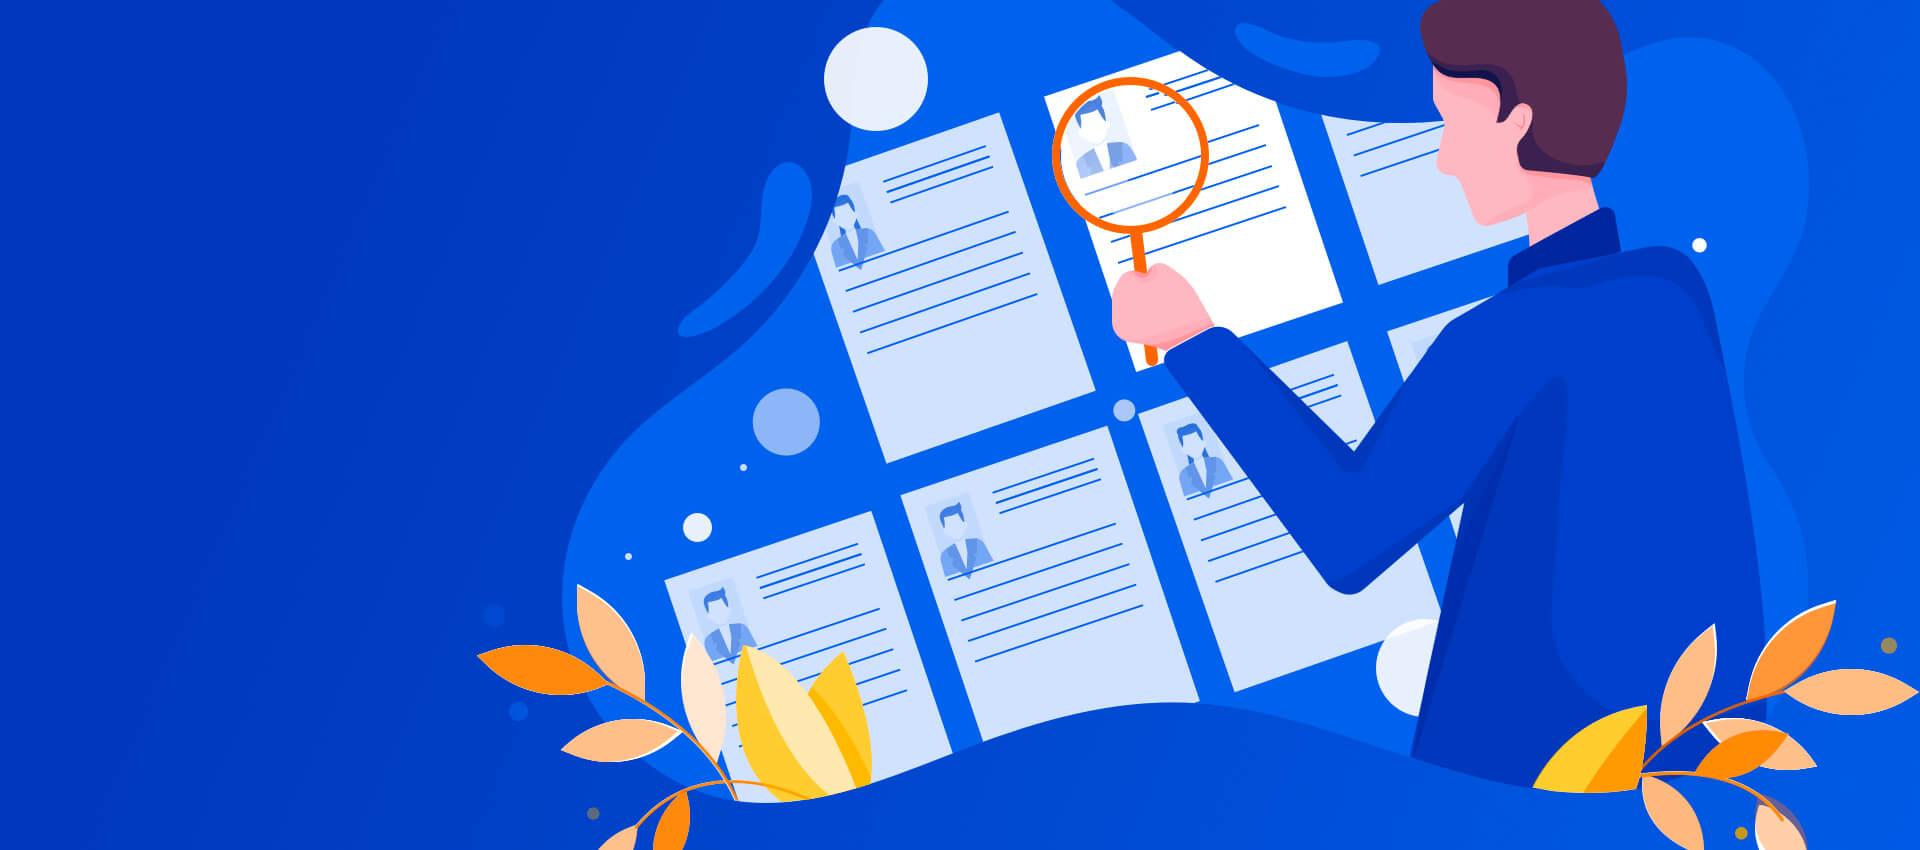 illustration of hiring manager looking at resumes